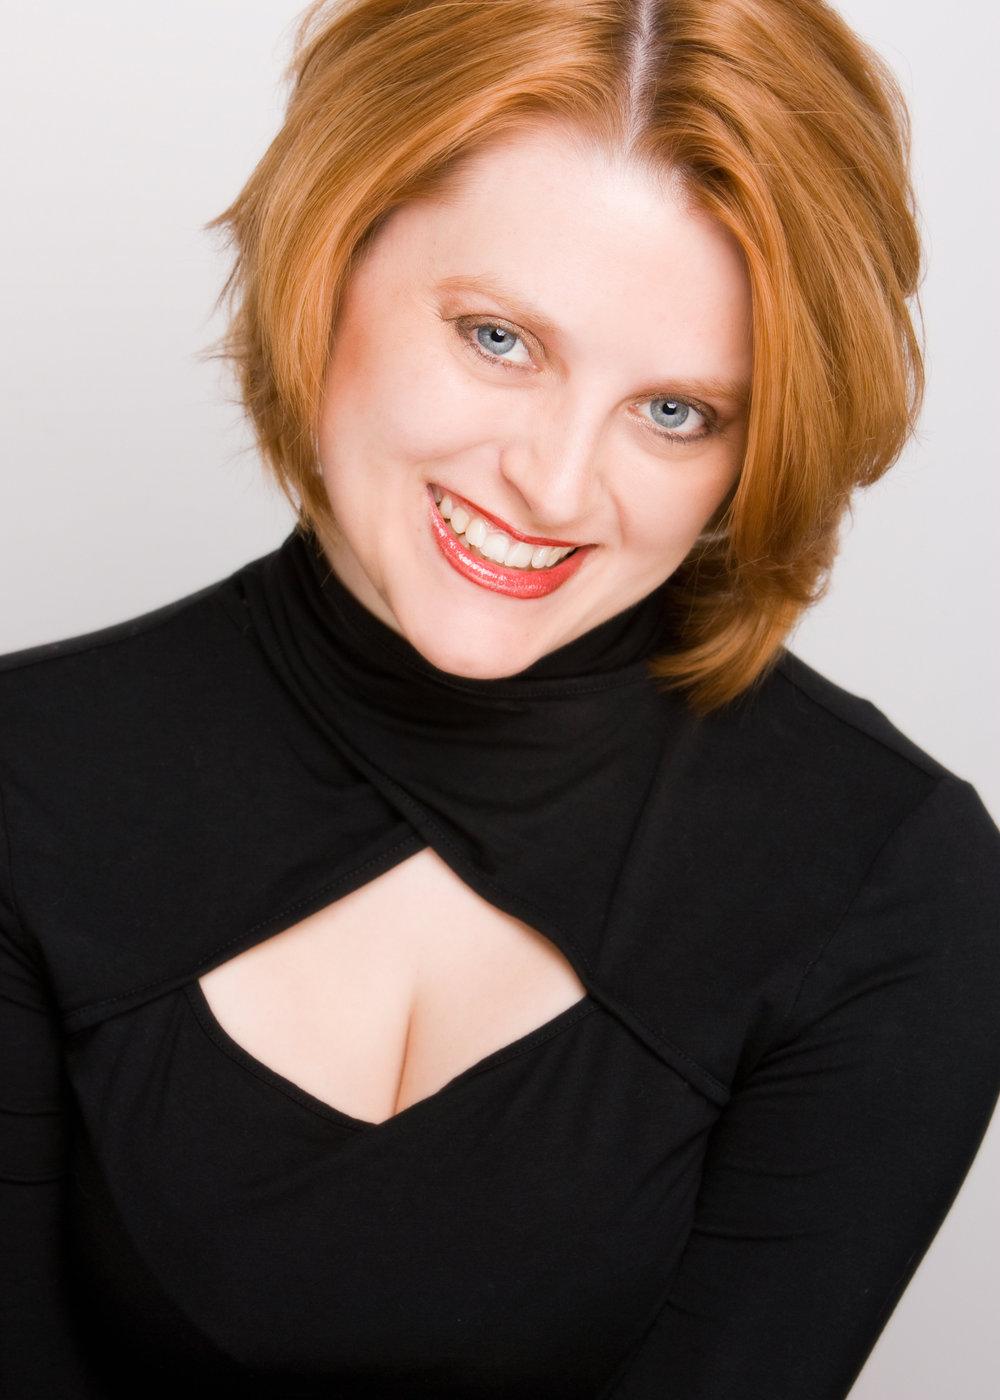 Michelle Rene